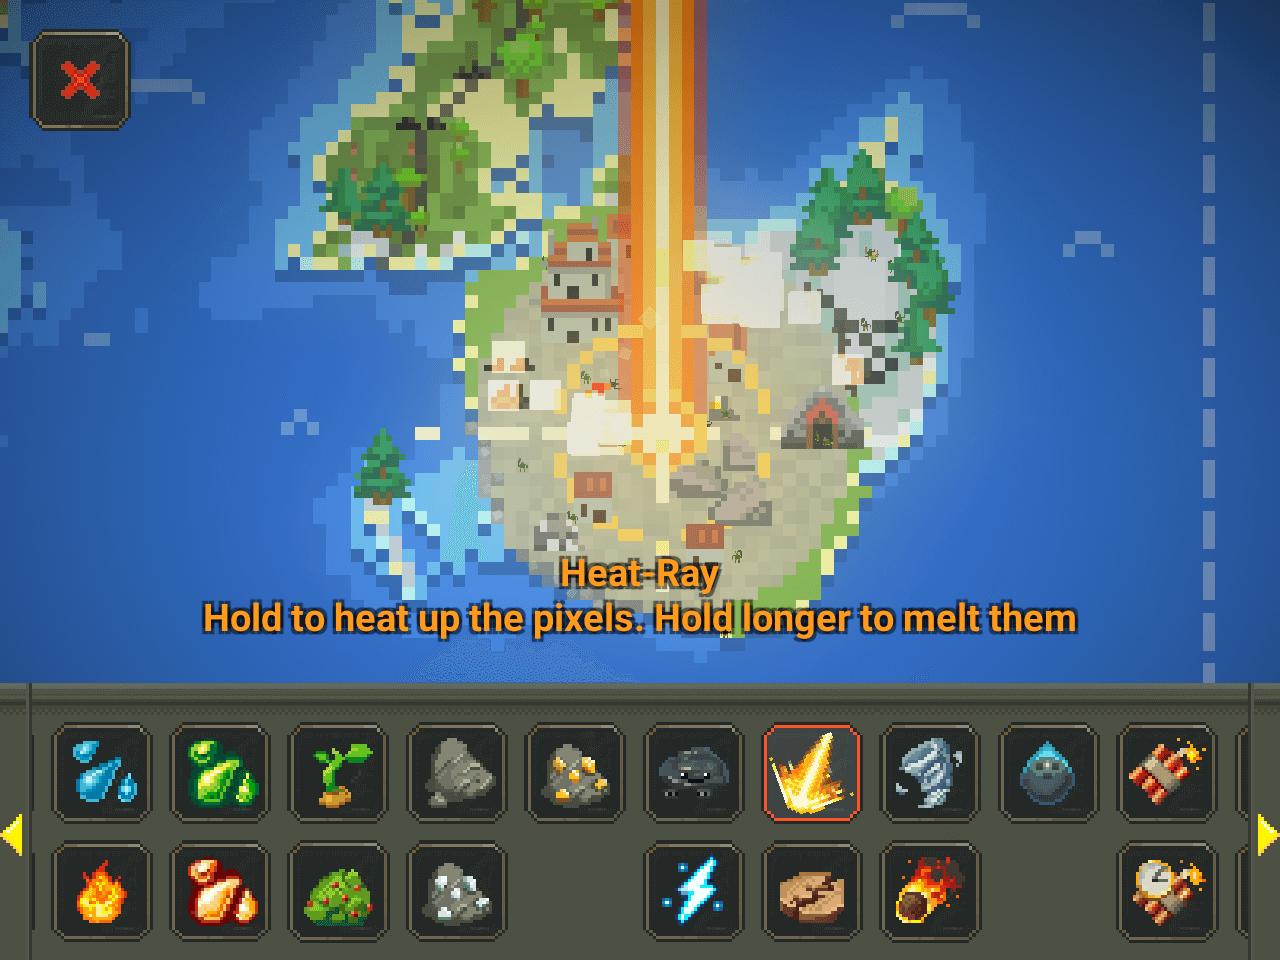 https://www.superworldbox.com/img/screenshots/07.png